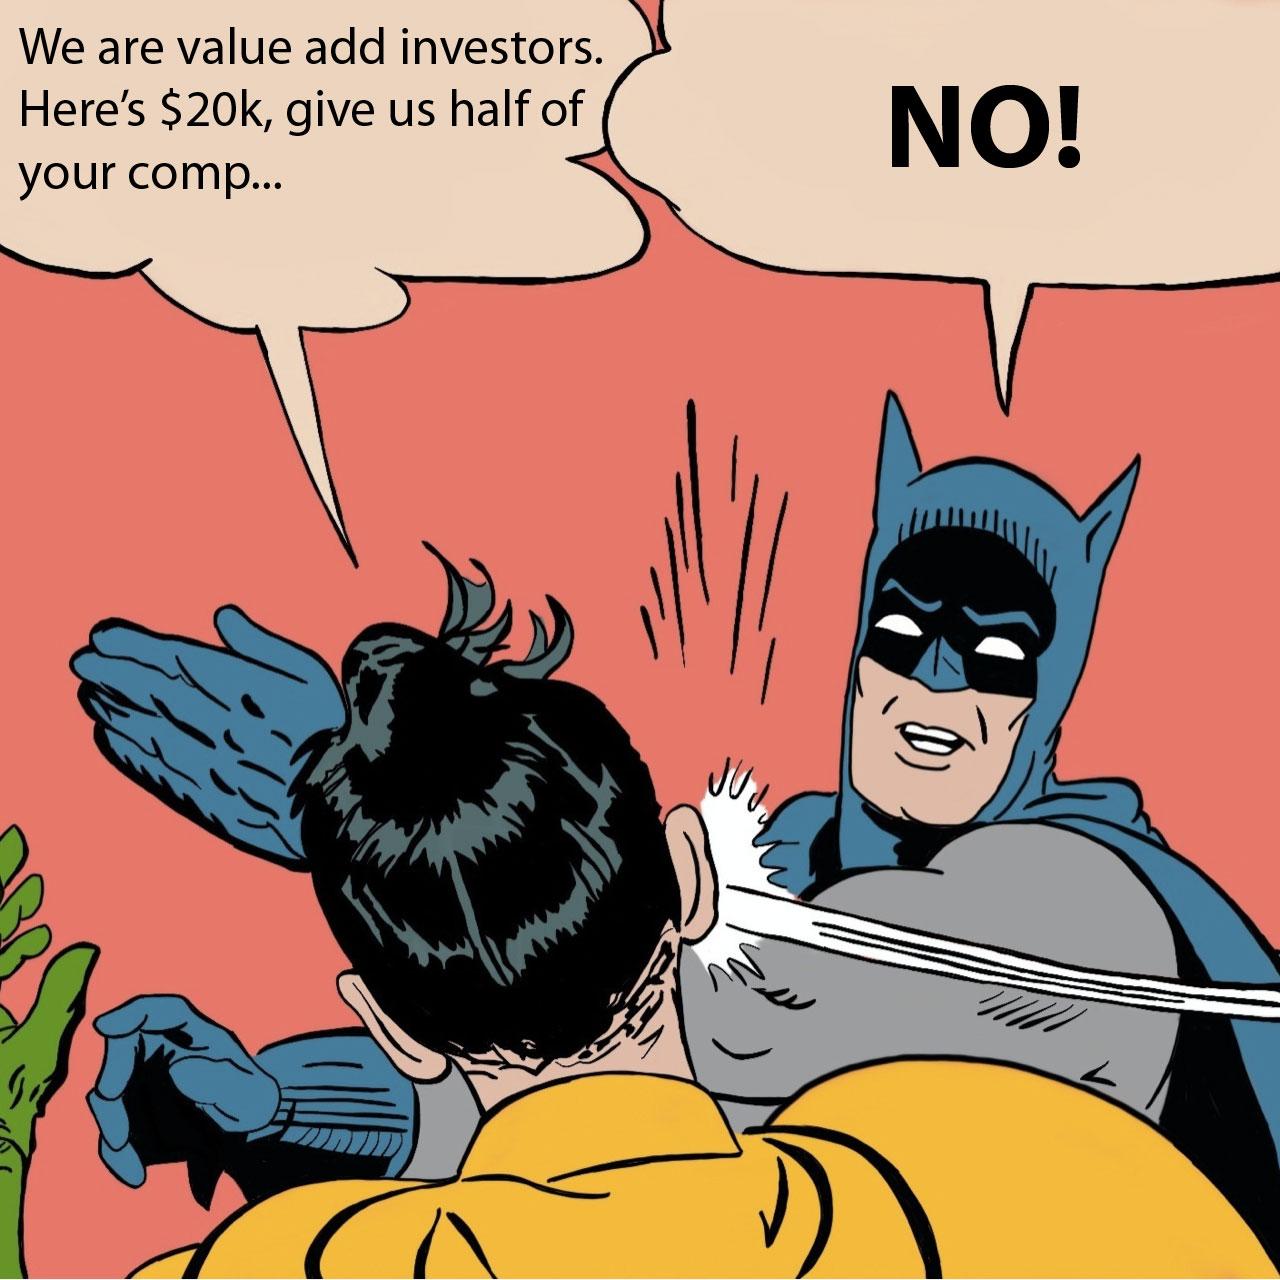 Value add investors